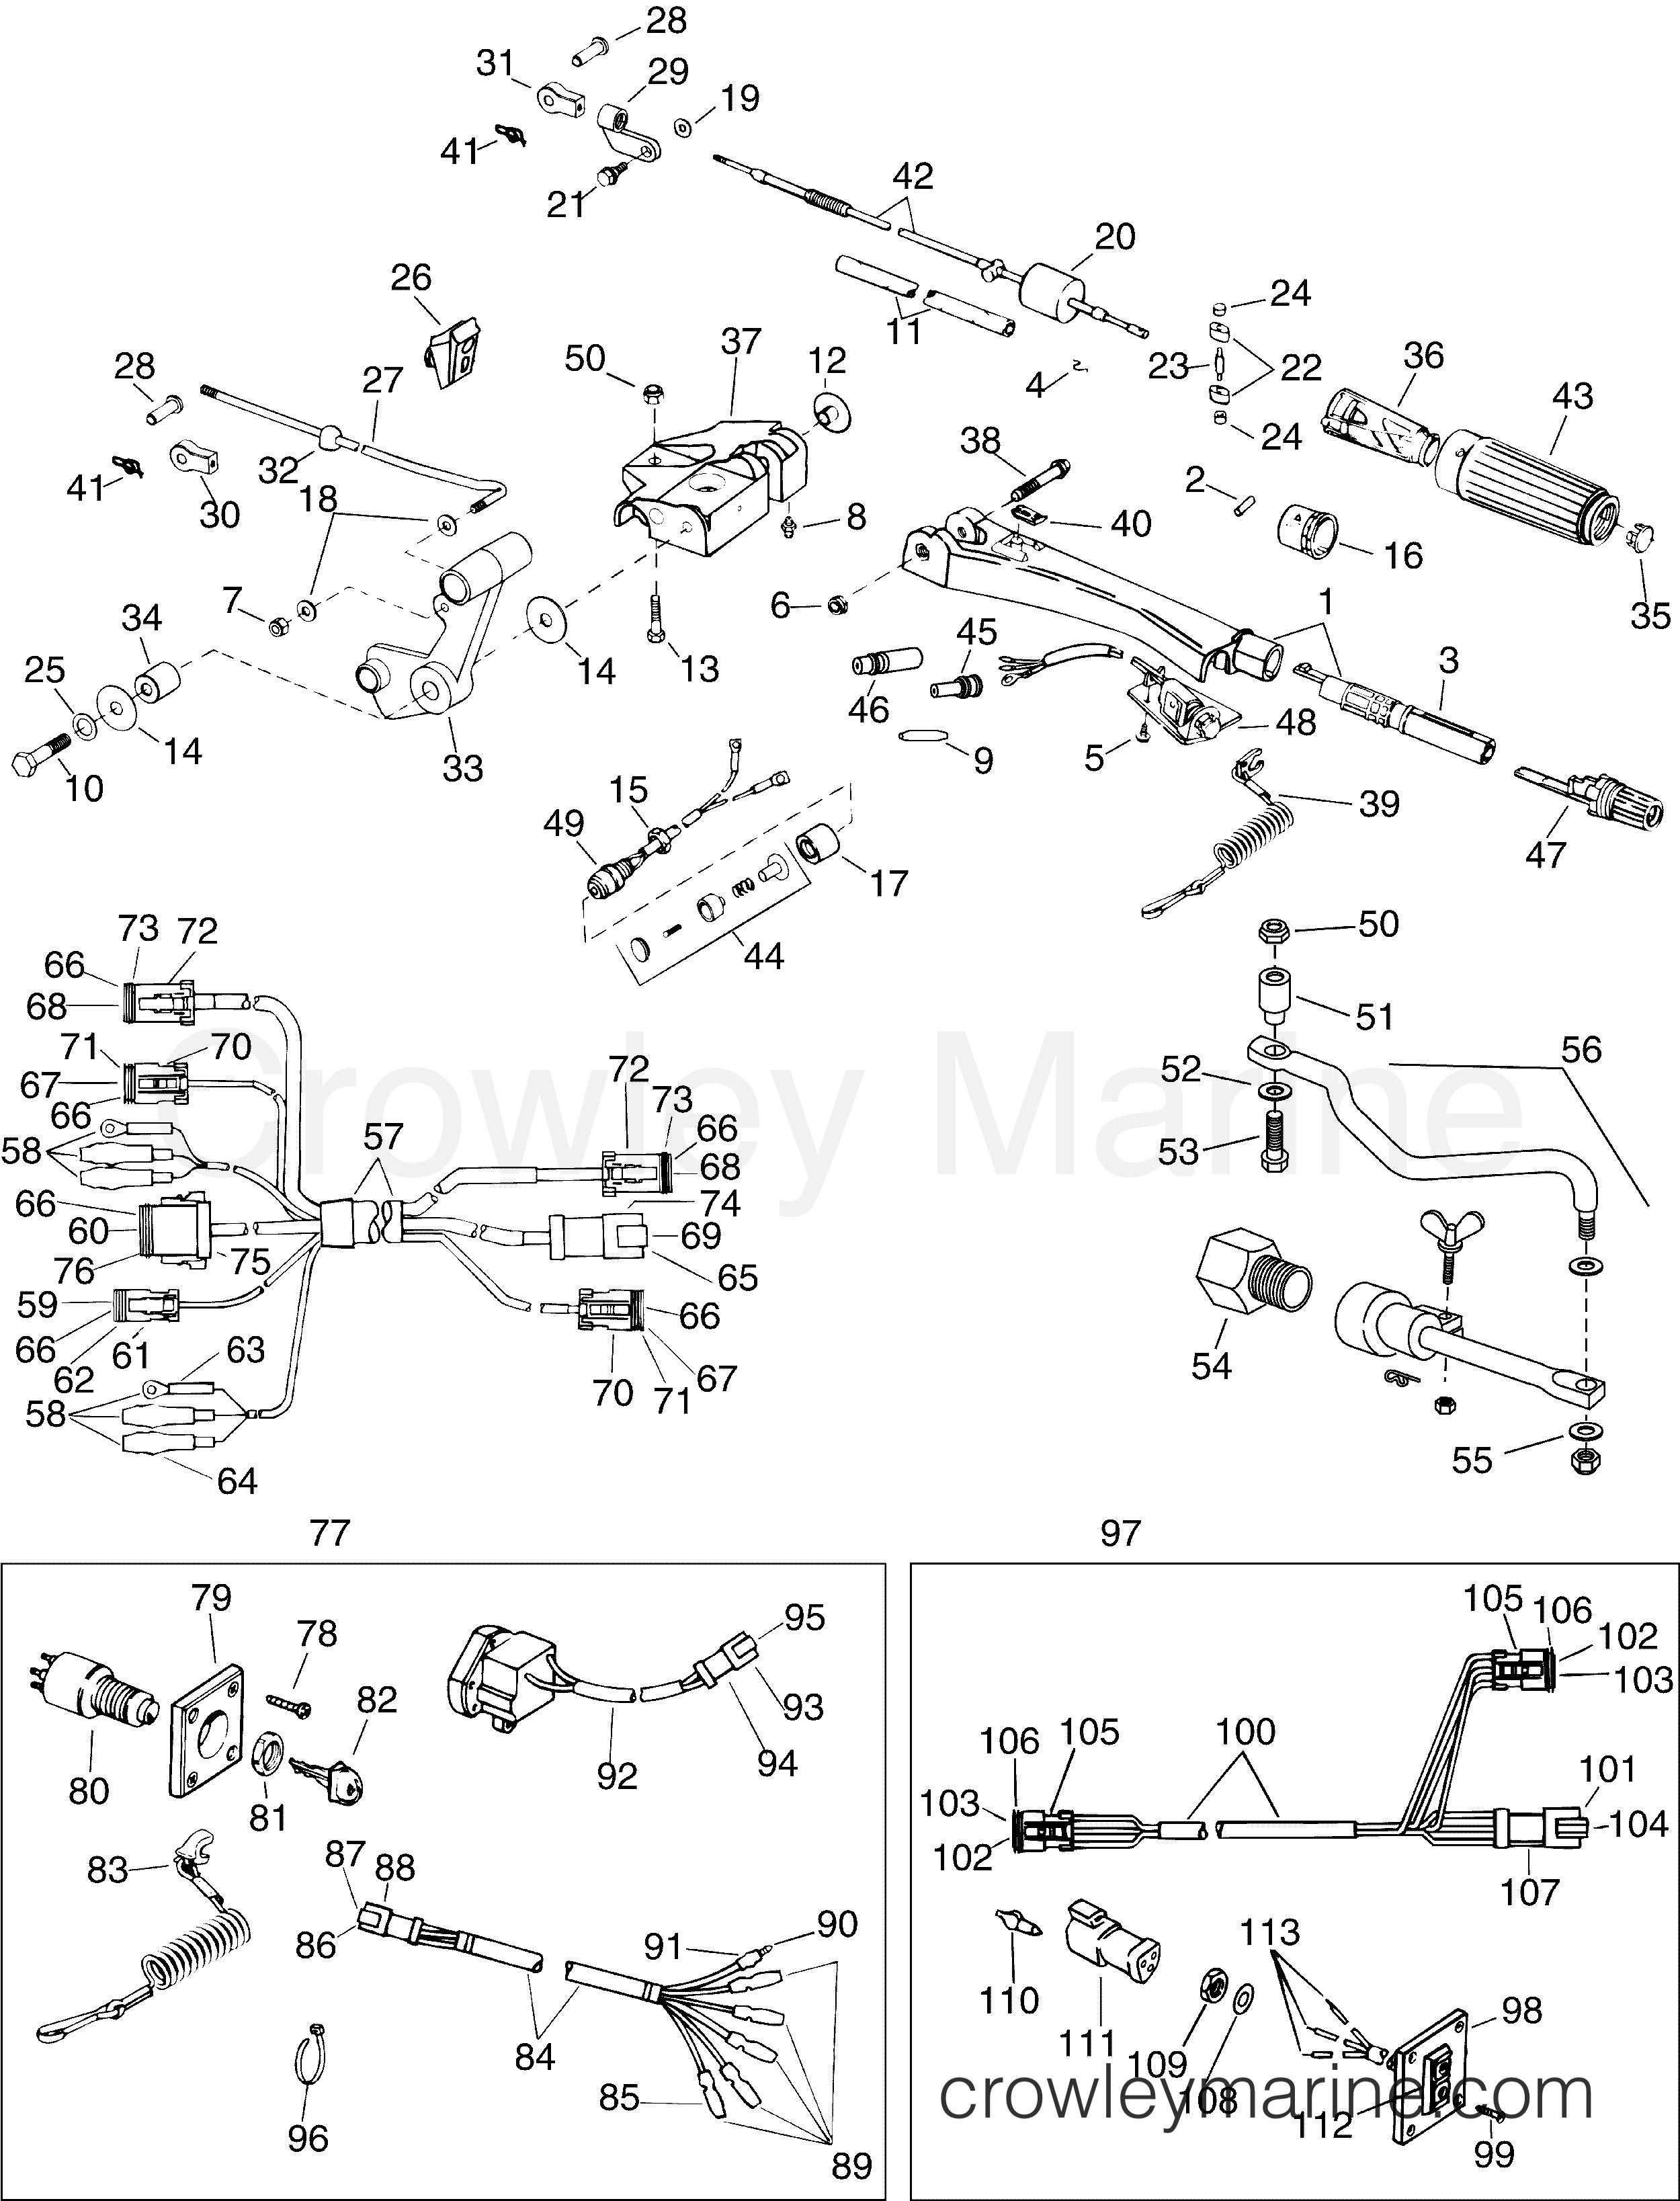 2001 honda rubicon wiring diagram